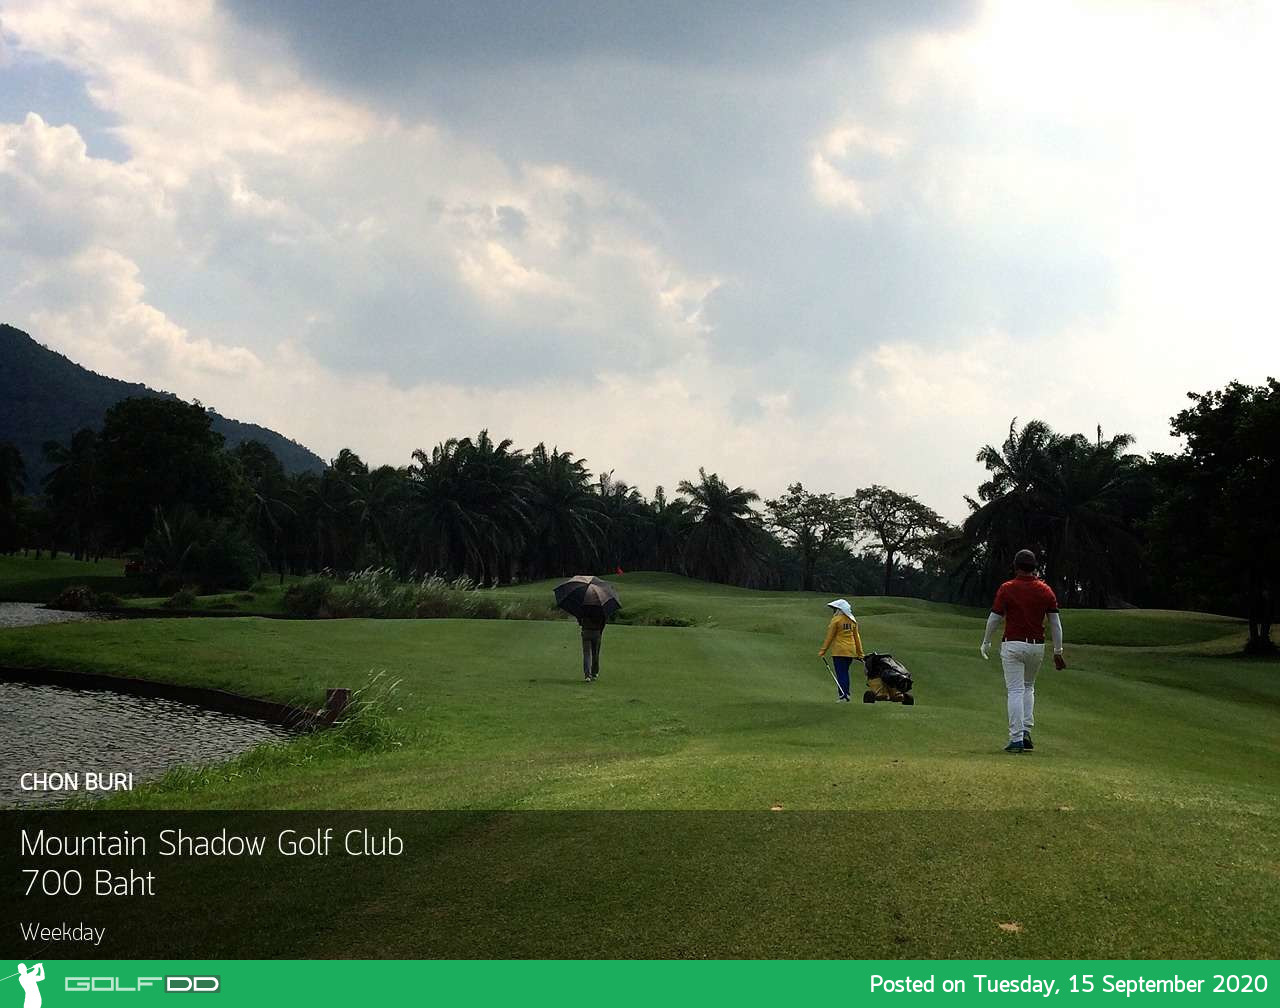 Mountain Shadow Golf Club สนามดีประจำจังหวัดชลบุรีพร้อมให้บริการโปรโมชั่นดีดีต้องที่นี้